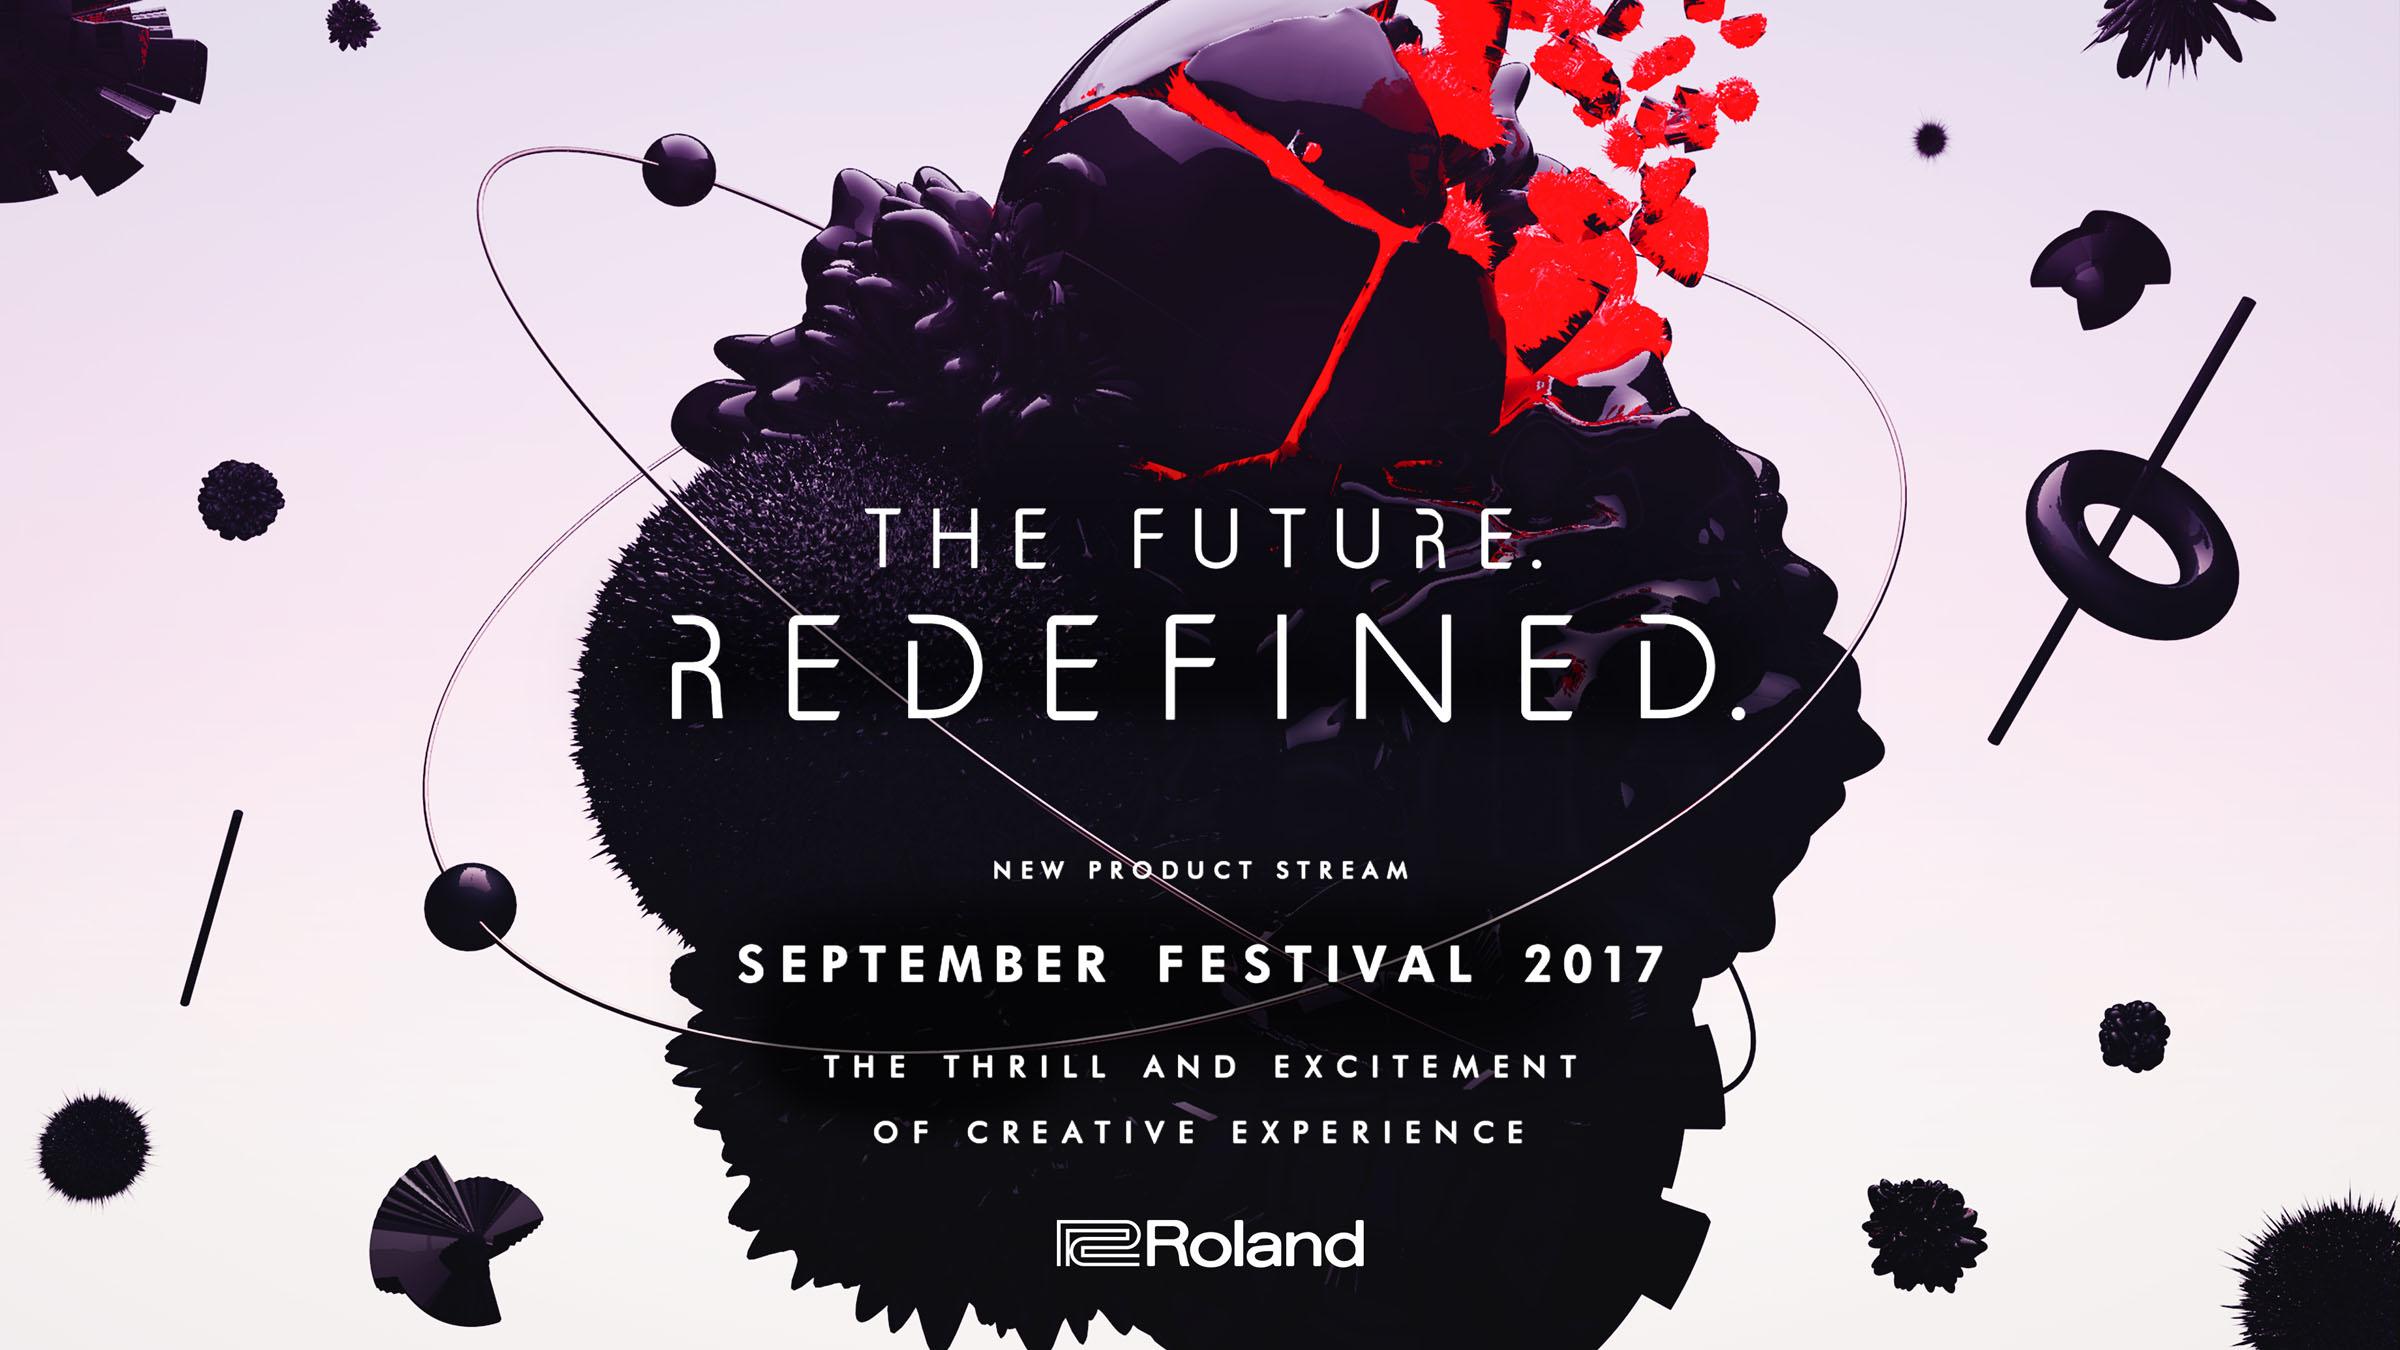 http://www.clynemedia.com/Roland/FutureRedefined_Sept2017/Roland_TheFutureRedefined.jpg